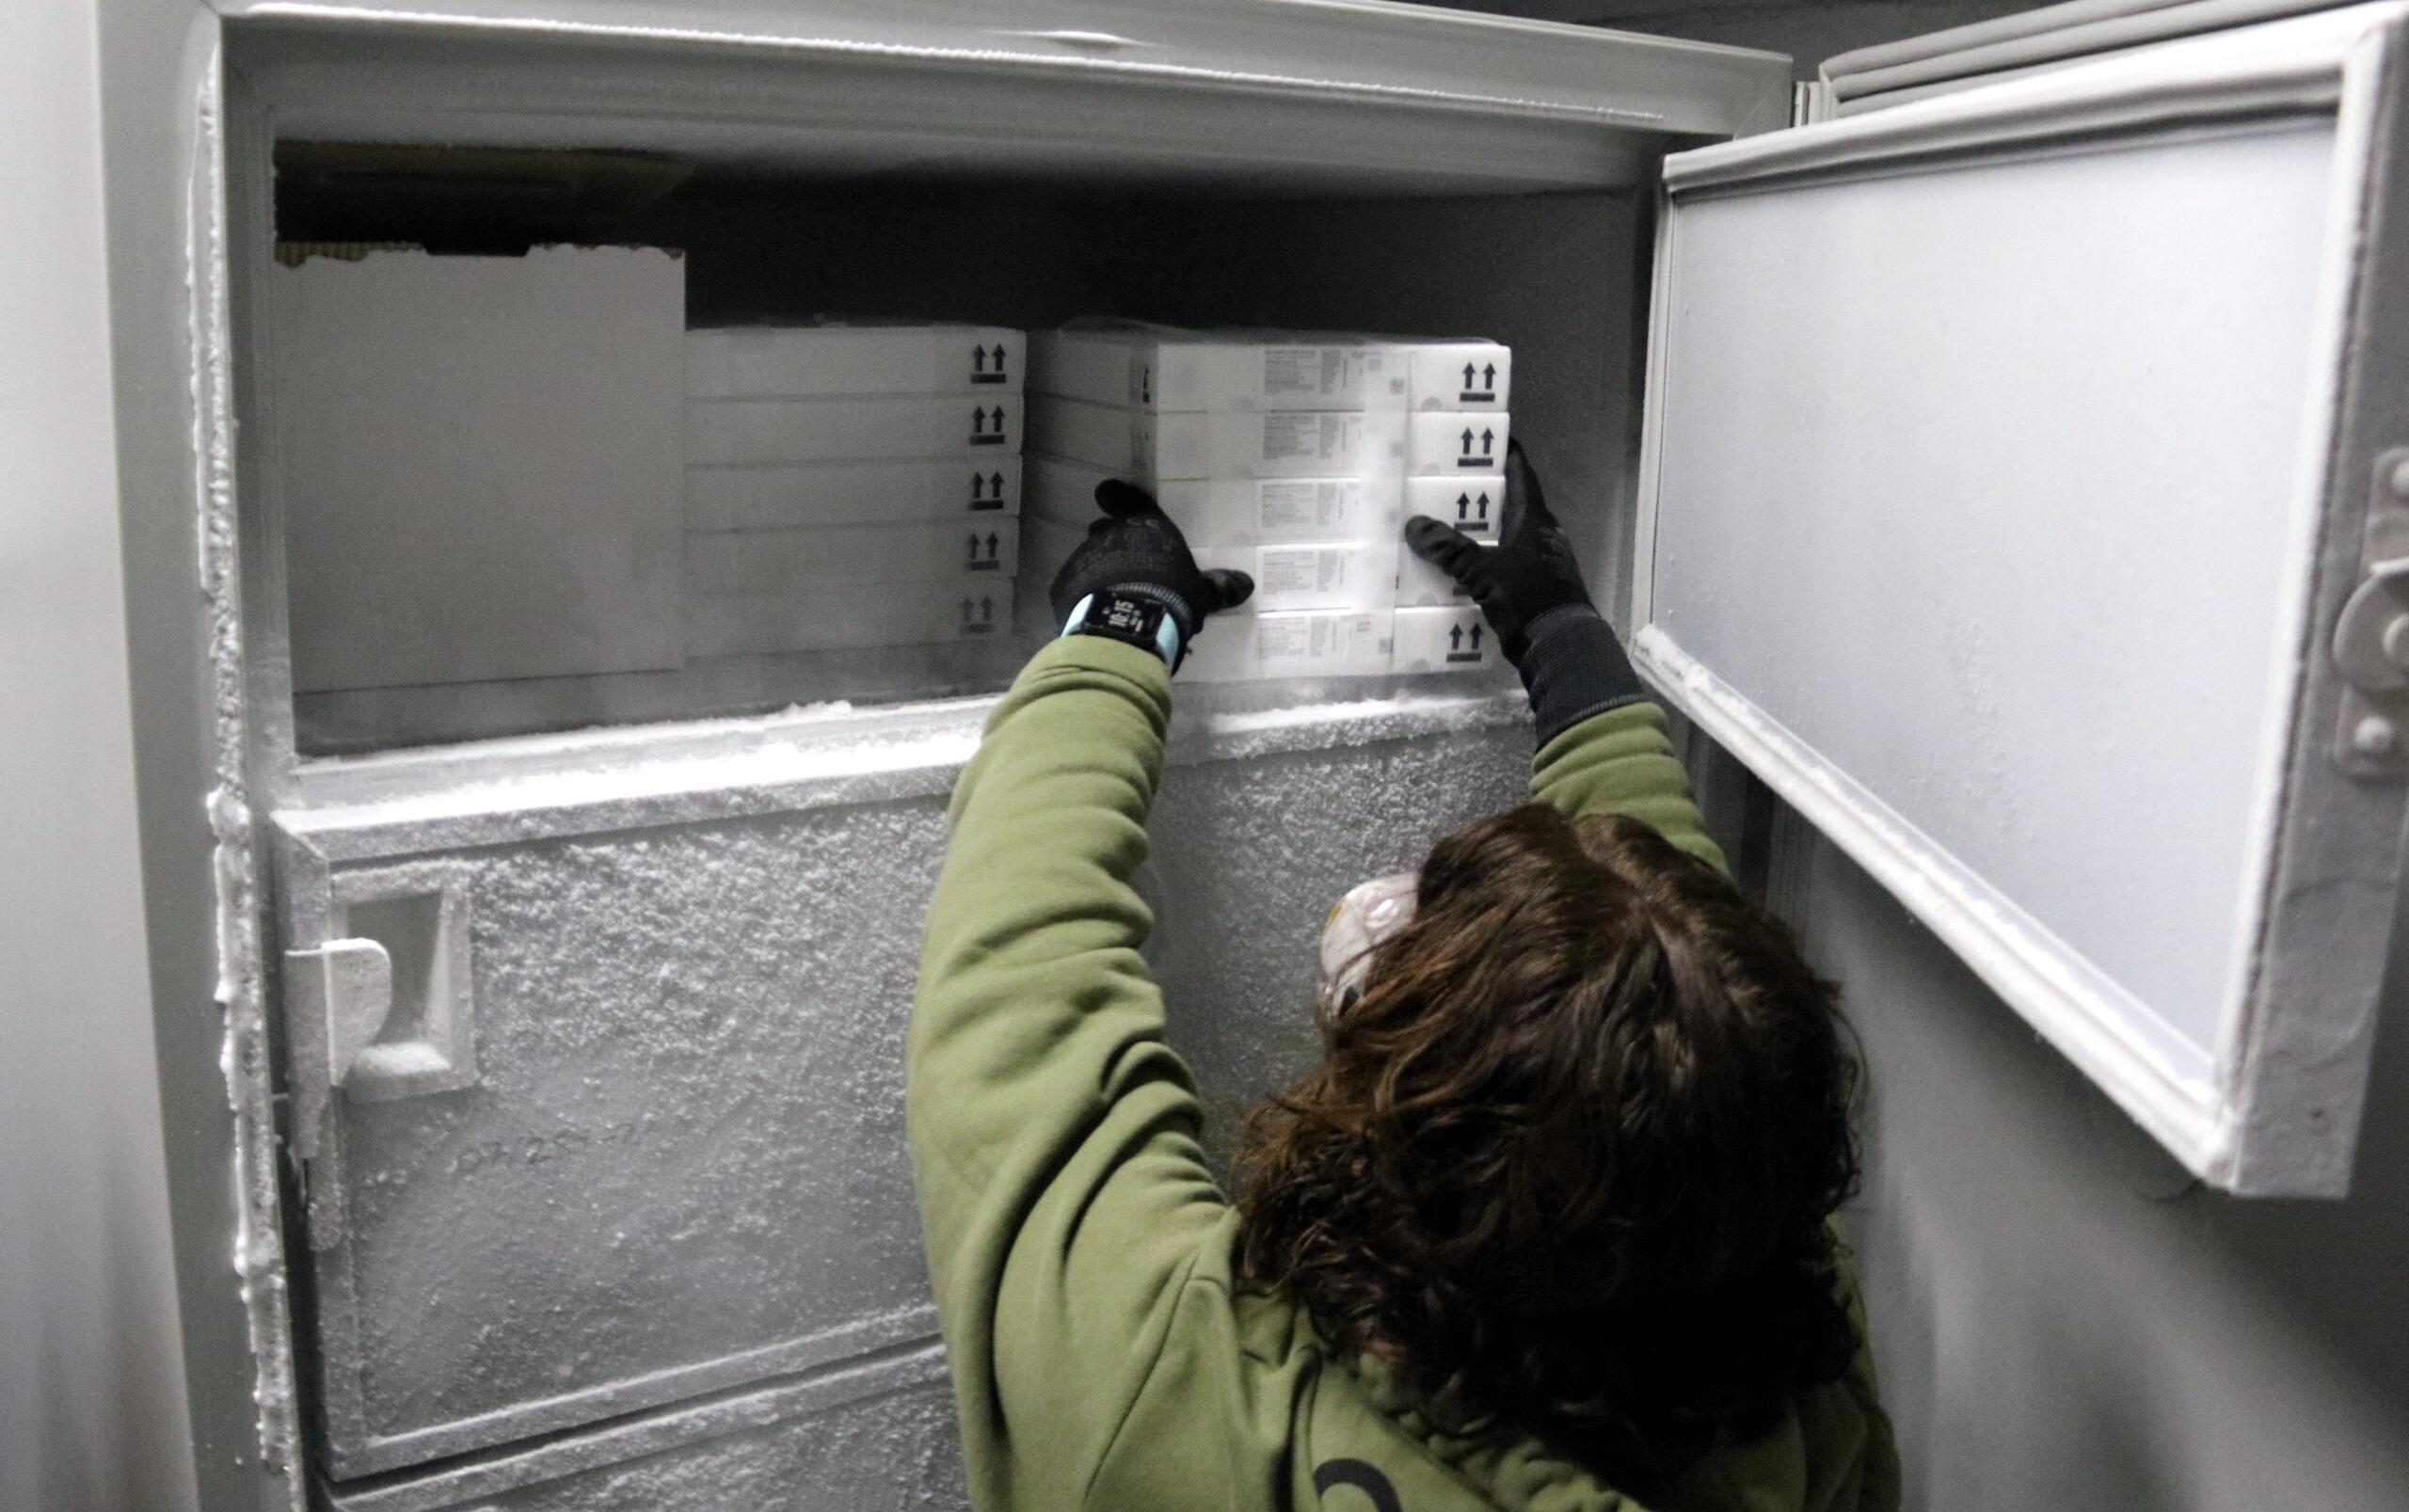 Una treballadora posant una capsa de vacunes al congelador | ACN